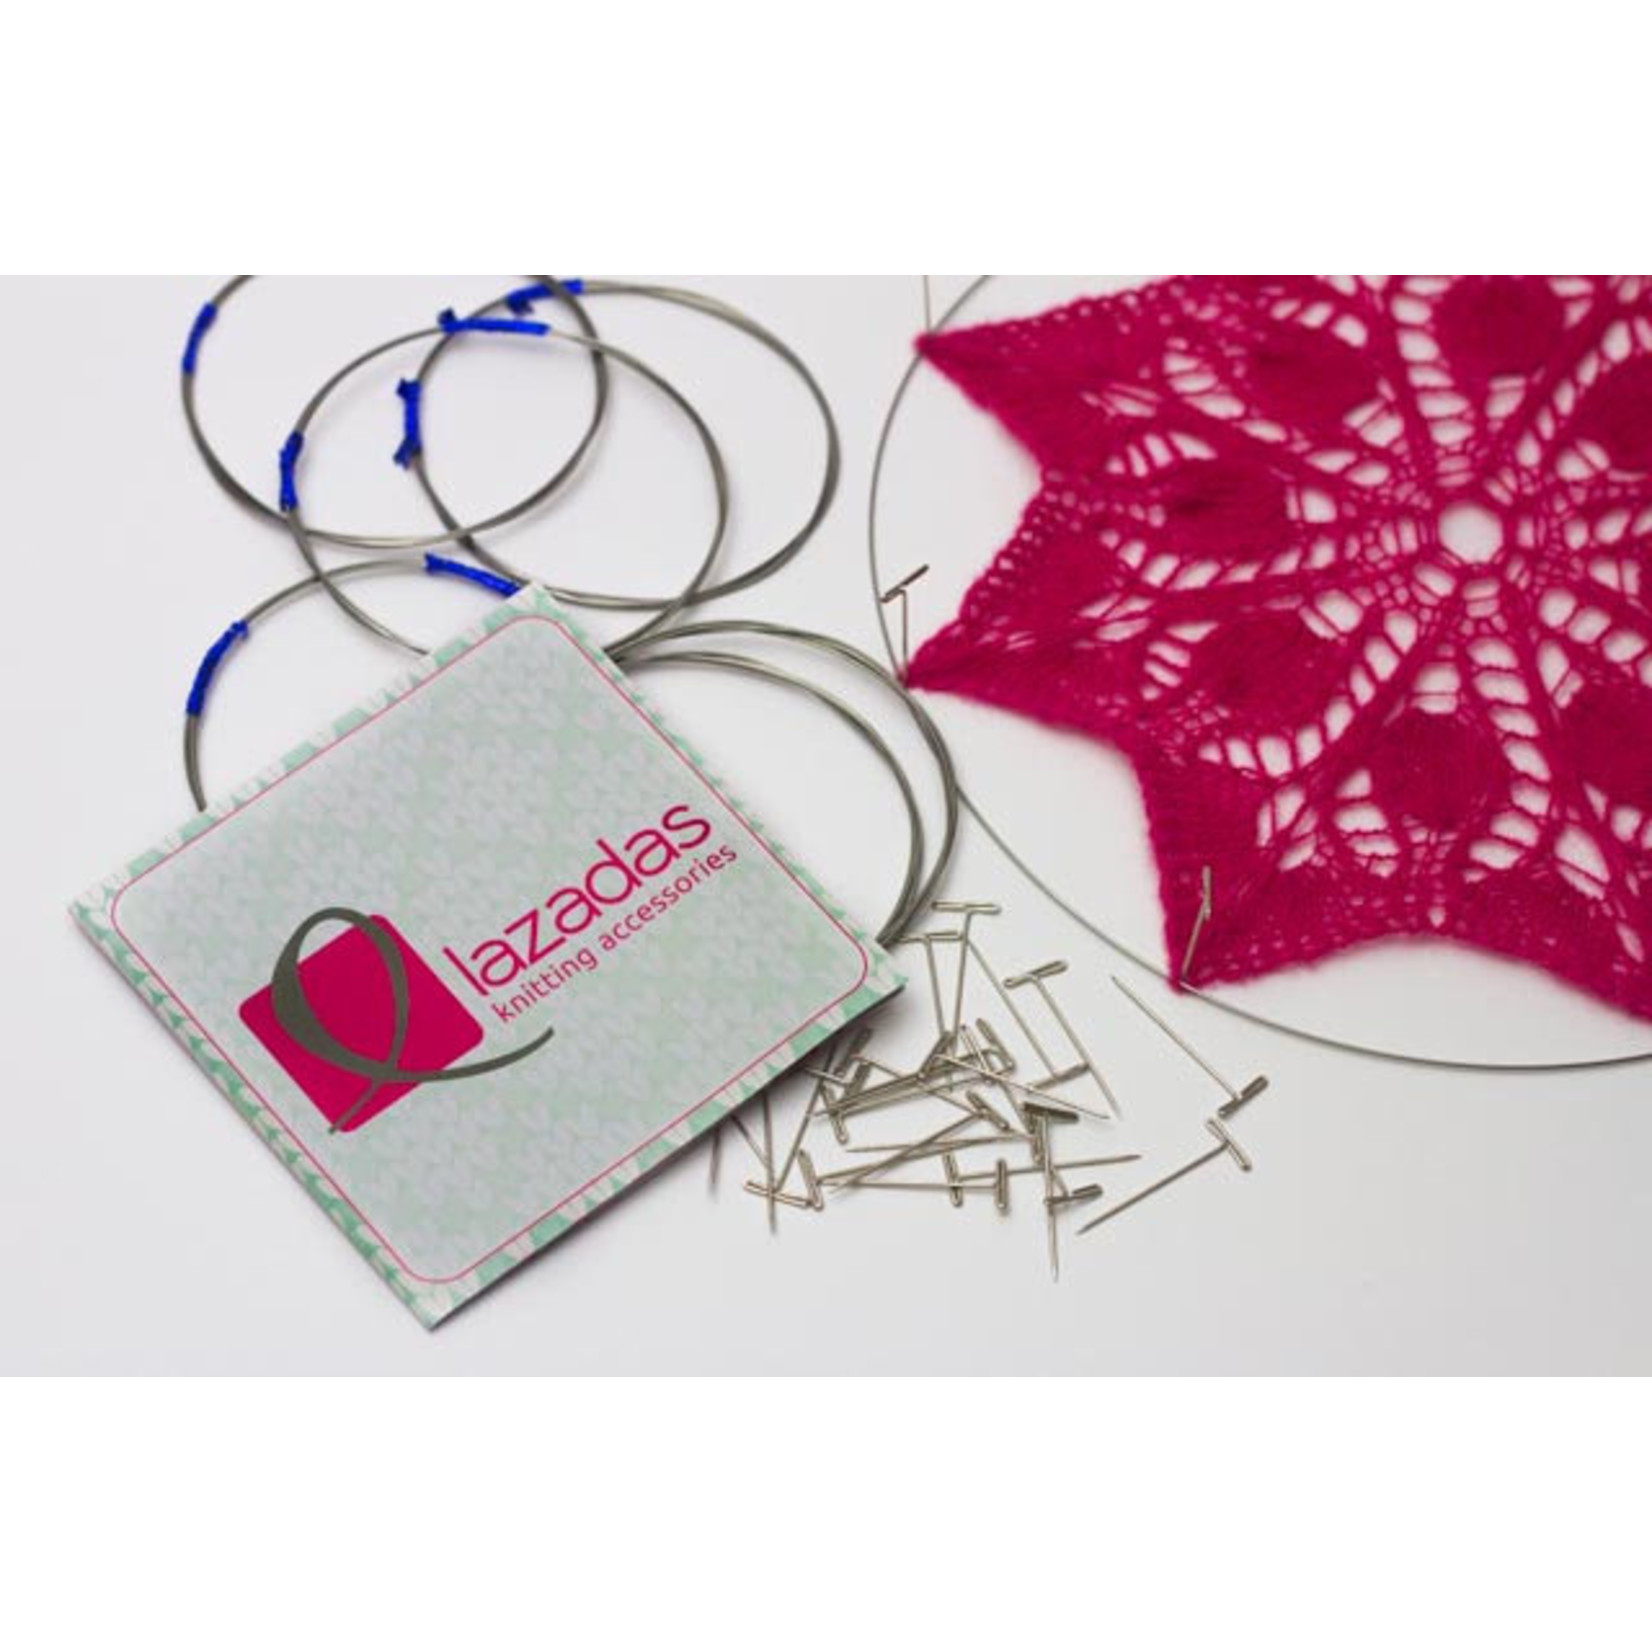 Lazadas Knitting Blocking Wires